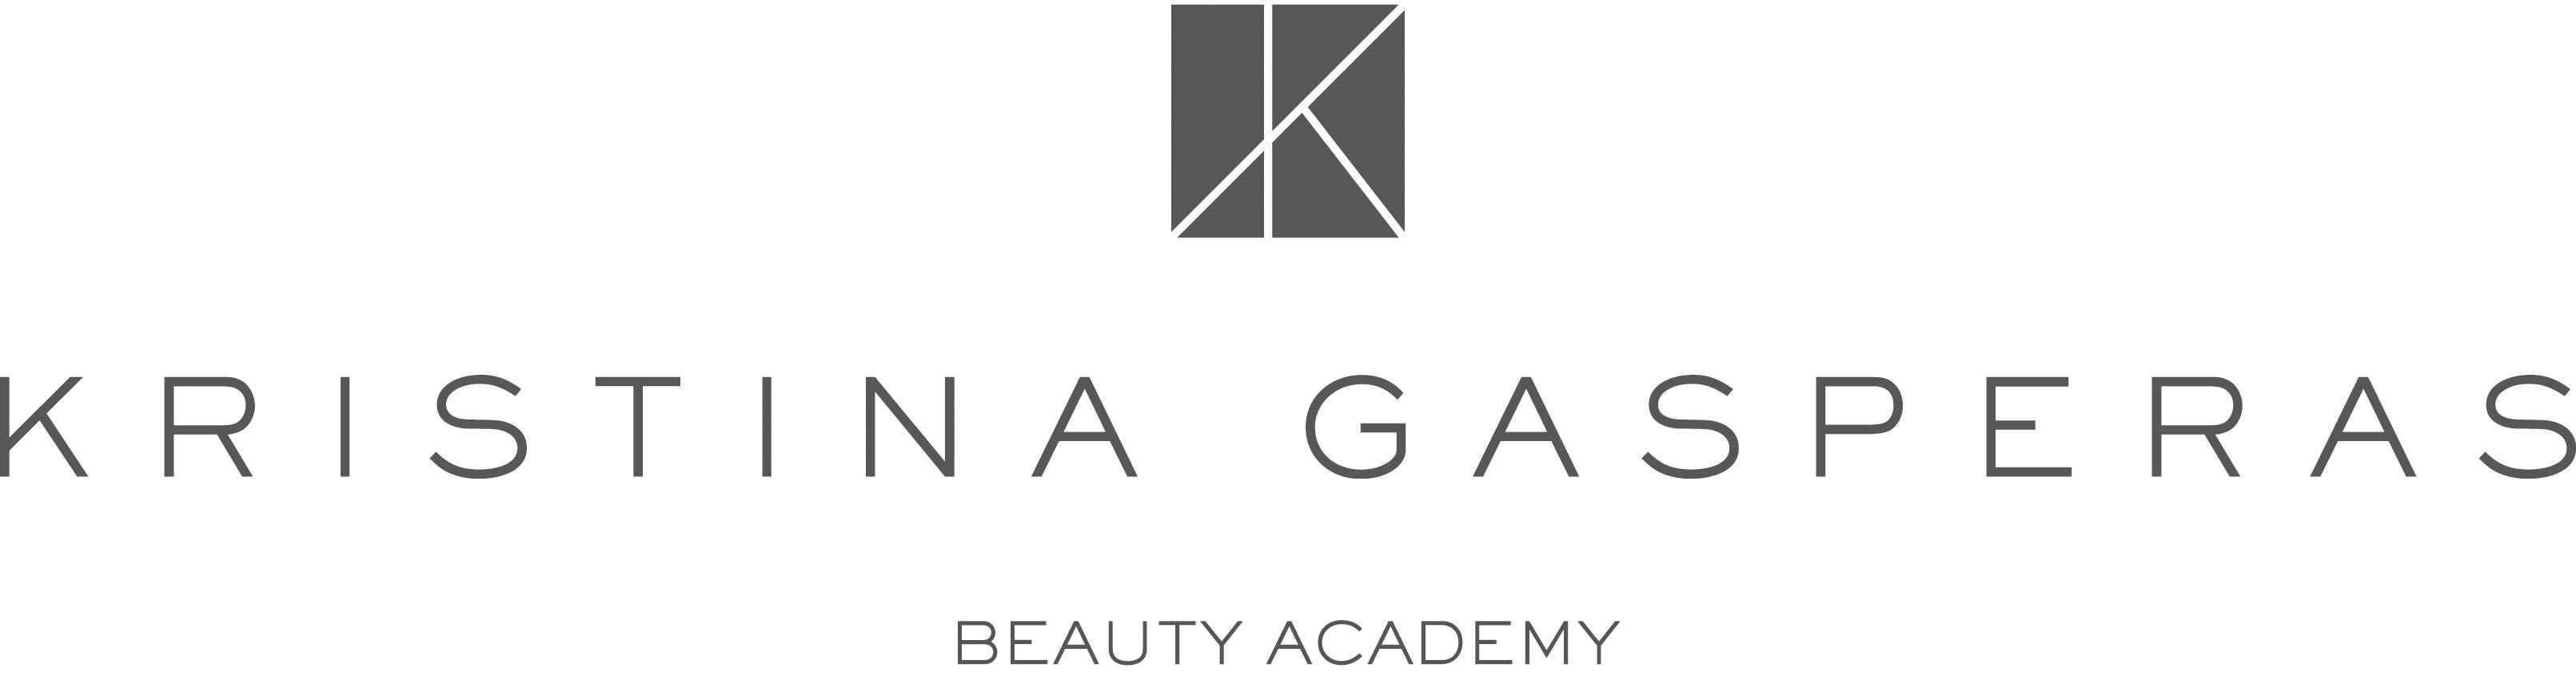 Kristina Gasperas Beauty Academy